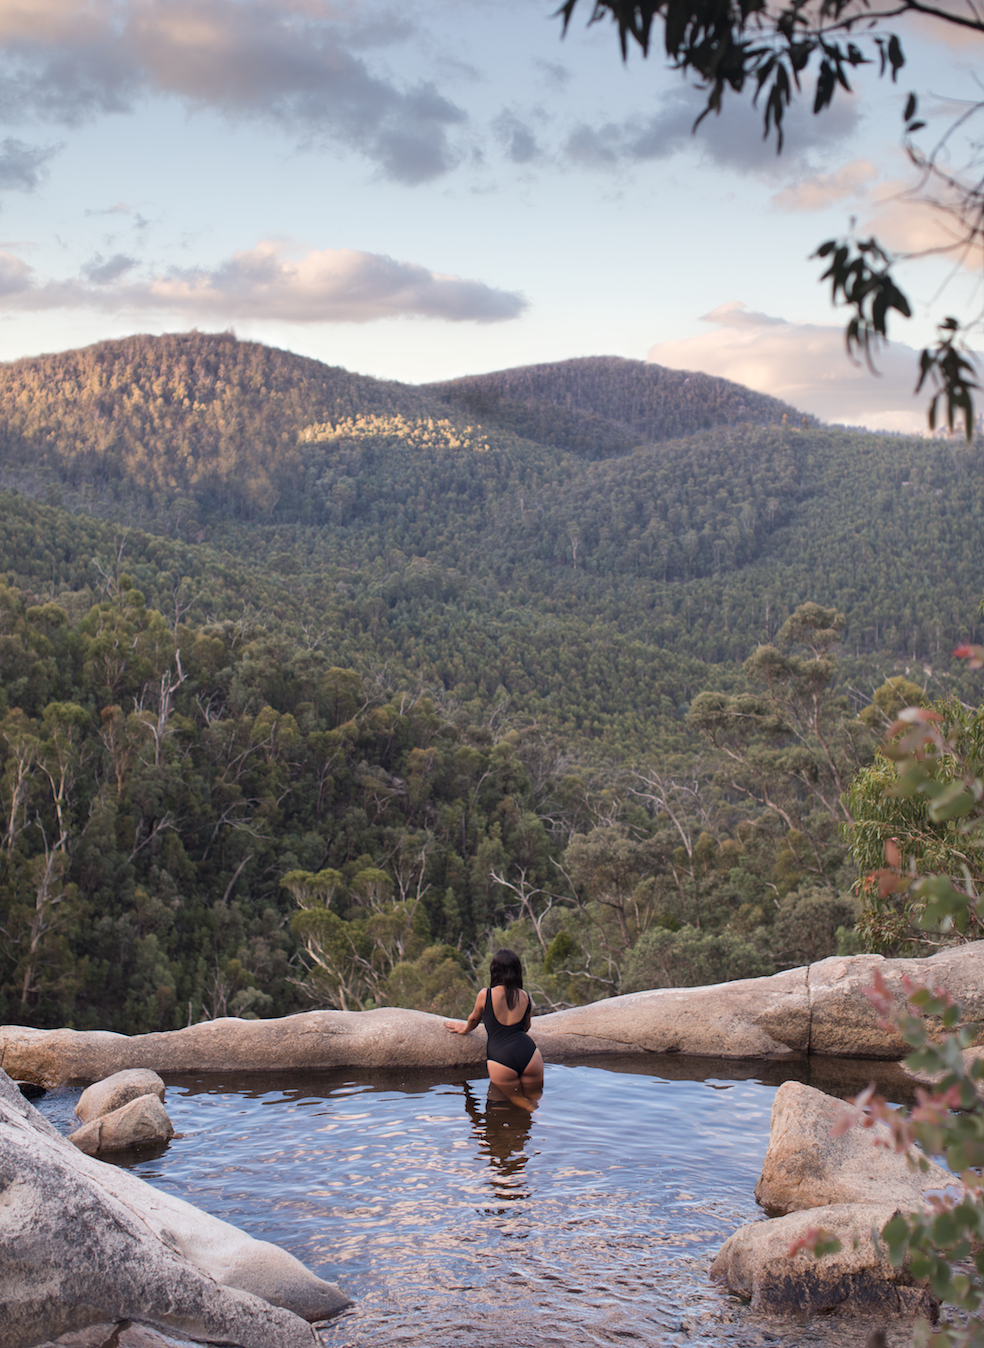 Hidden gem in Canberra's hils